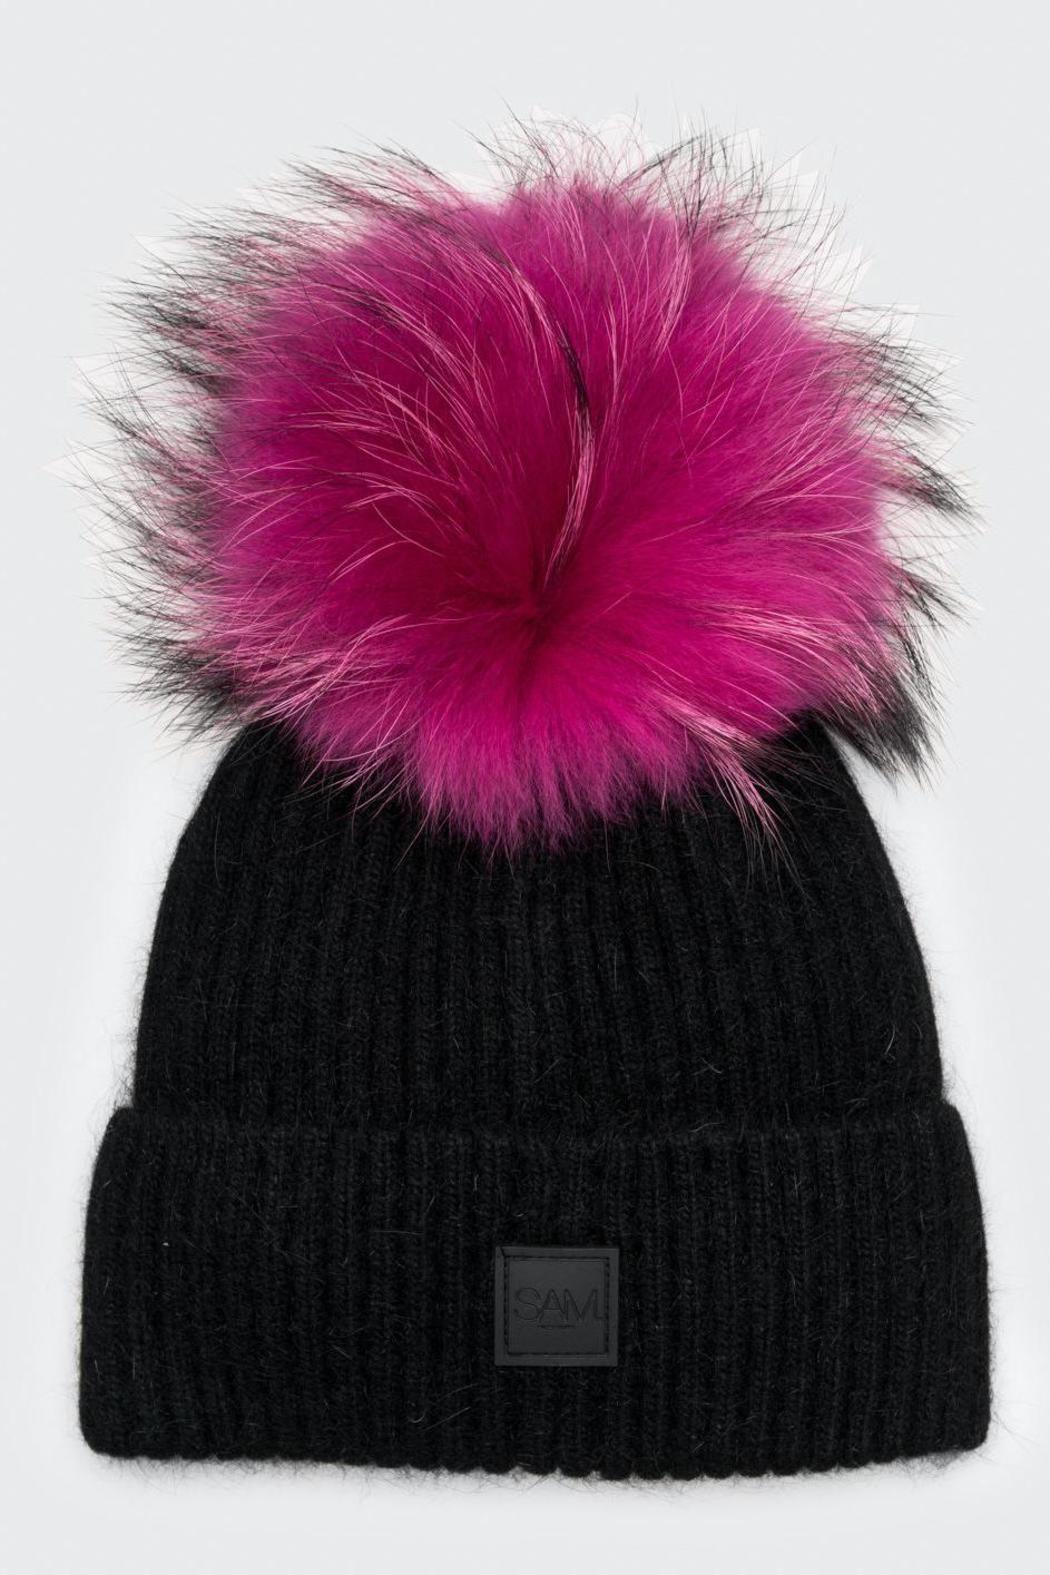 a9b8b2172 Sam. Fur Beanie | Fall Collection | Beanie hats, Fur pom pom hat ...